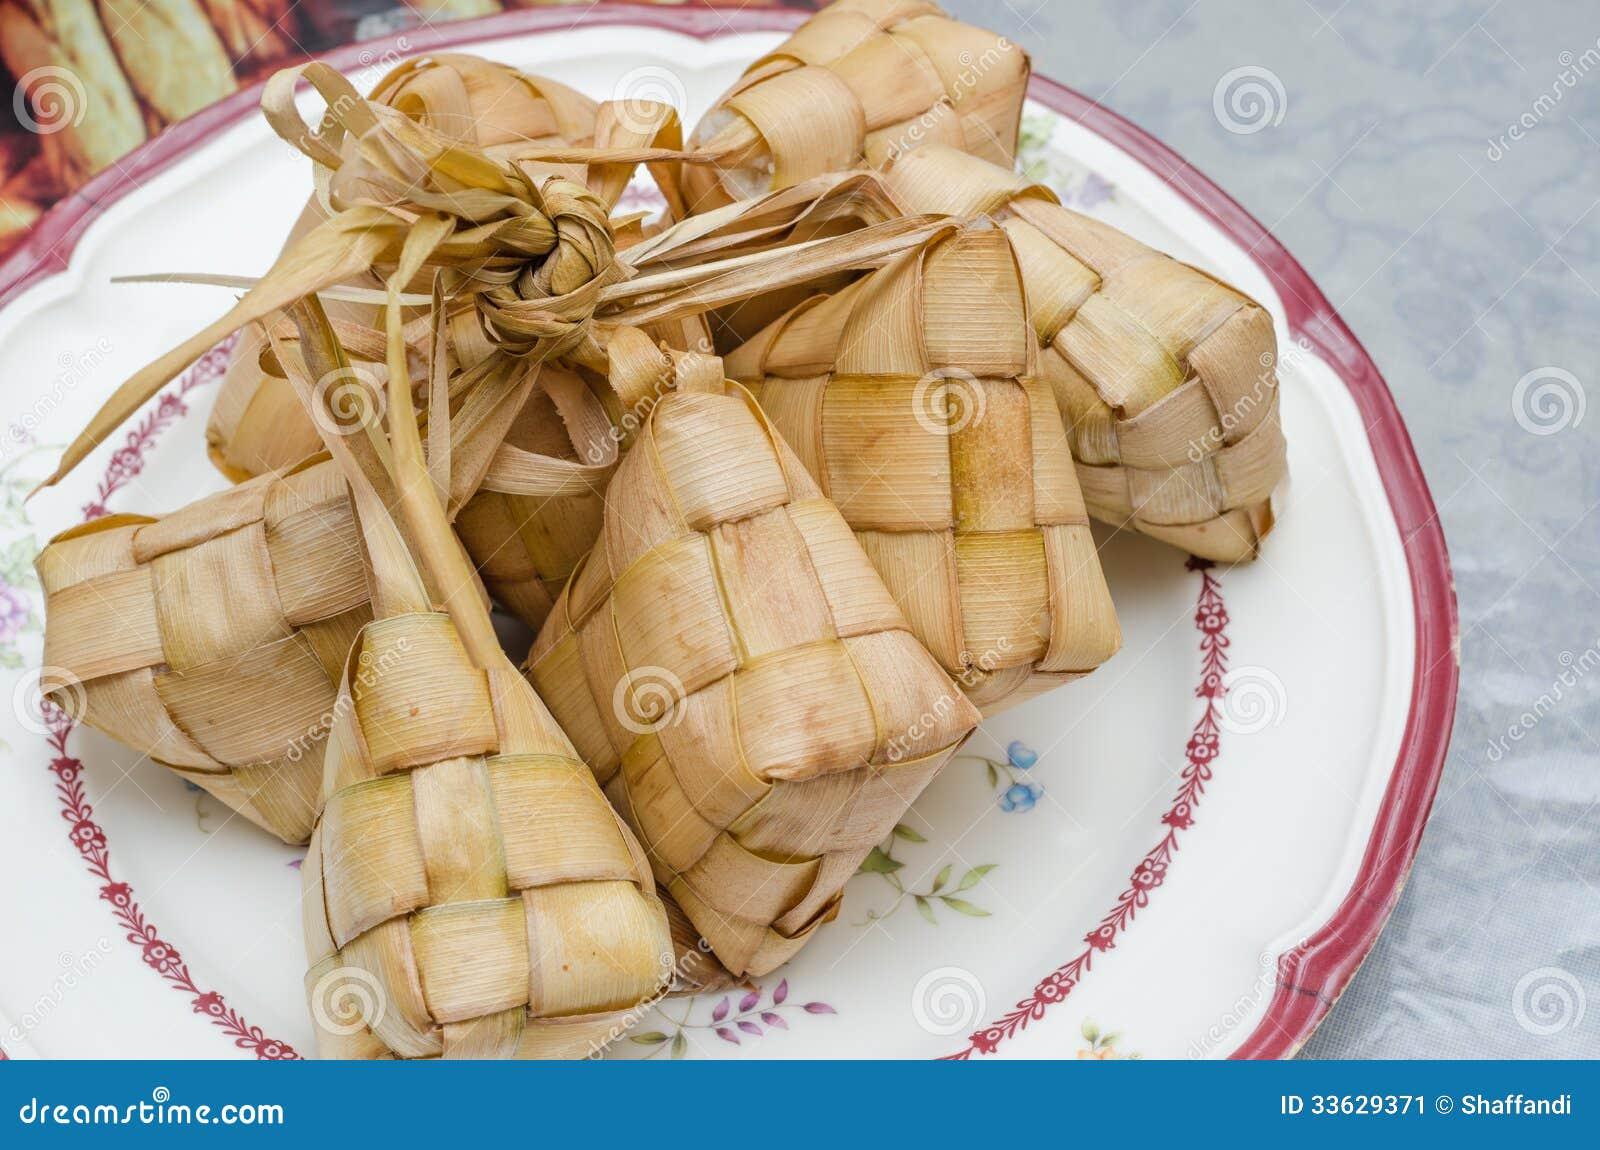 ketupat rice dumpling is - photo #4